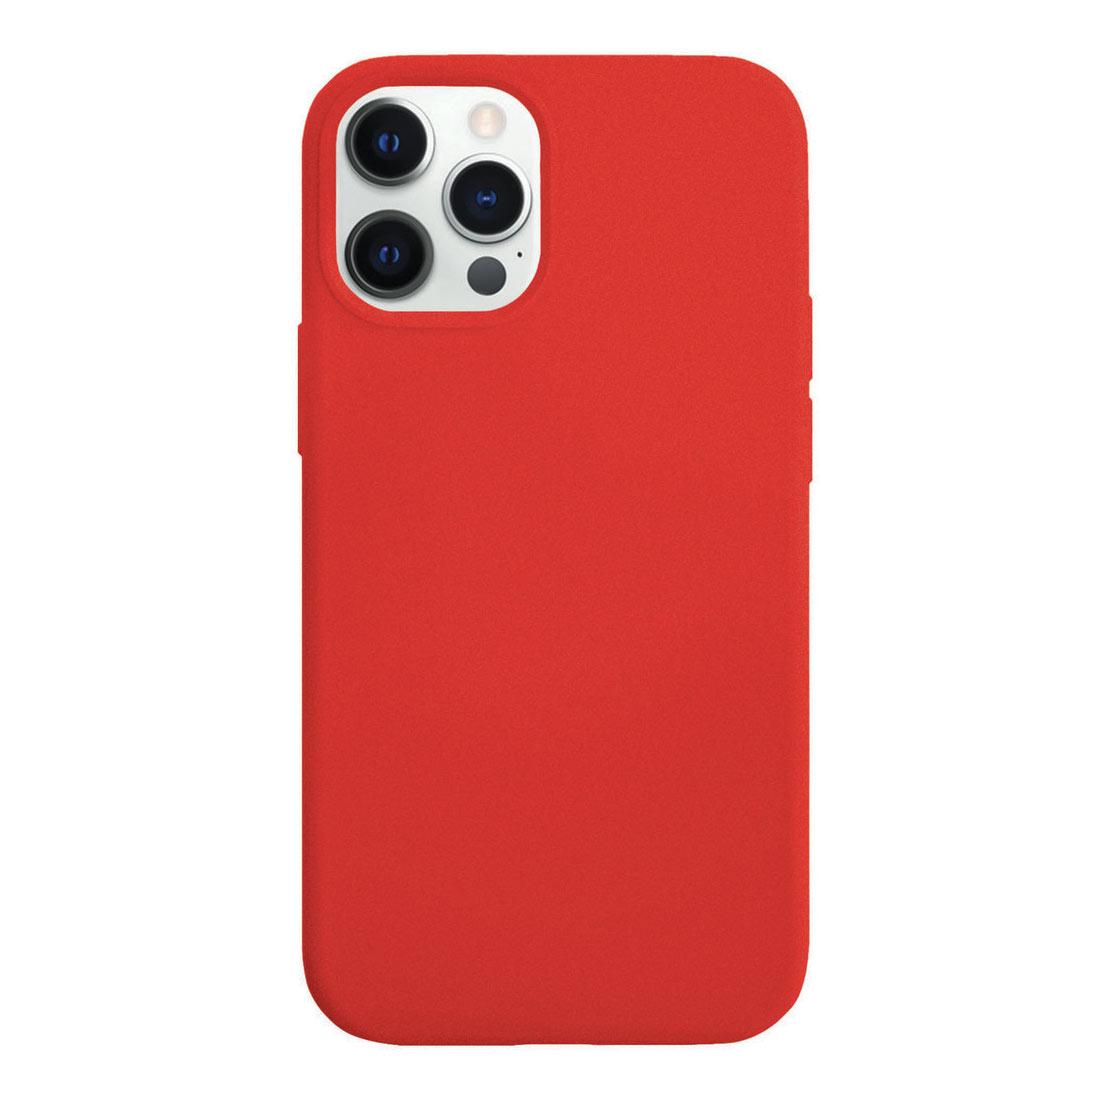 Чехол VLP Silicone Case для смартфона Apple iPhone 12/12 Pro, красный